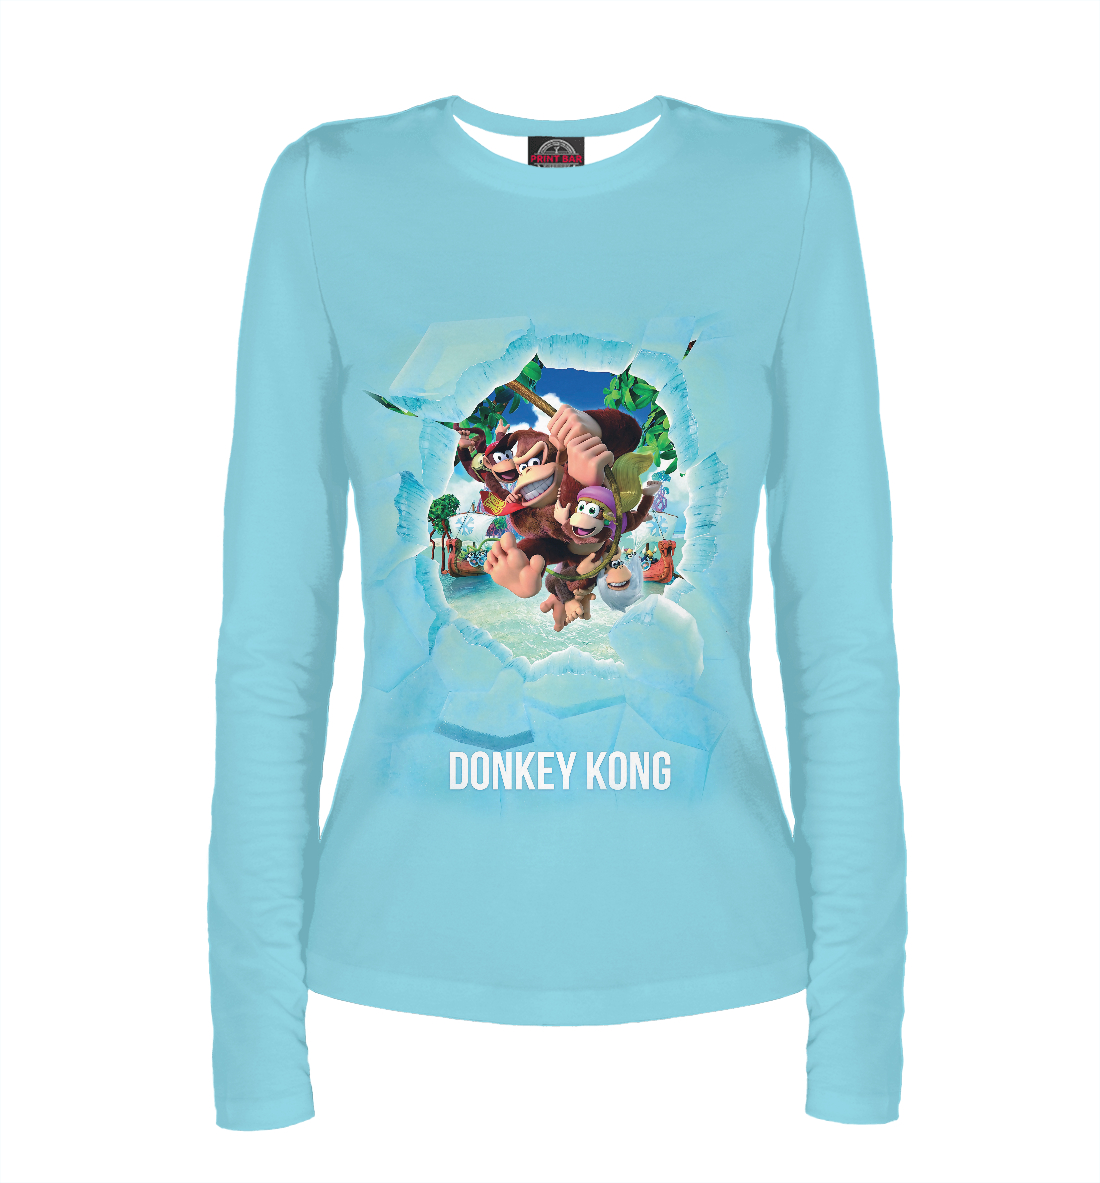 Купить Donkey Kong, Printbar, Лонгсливы, RPG-786965-lon-1